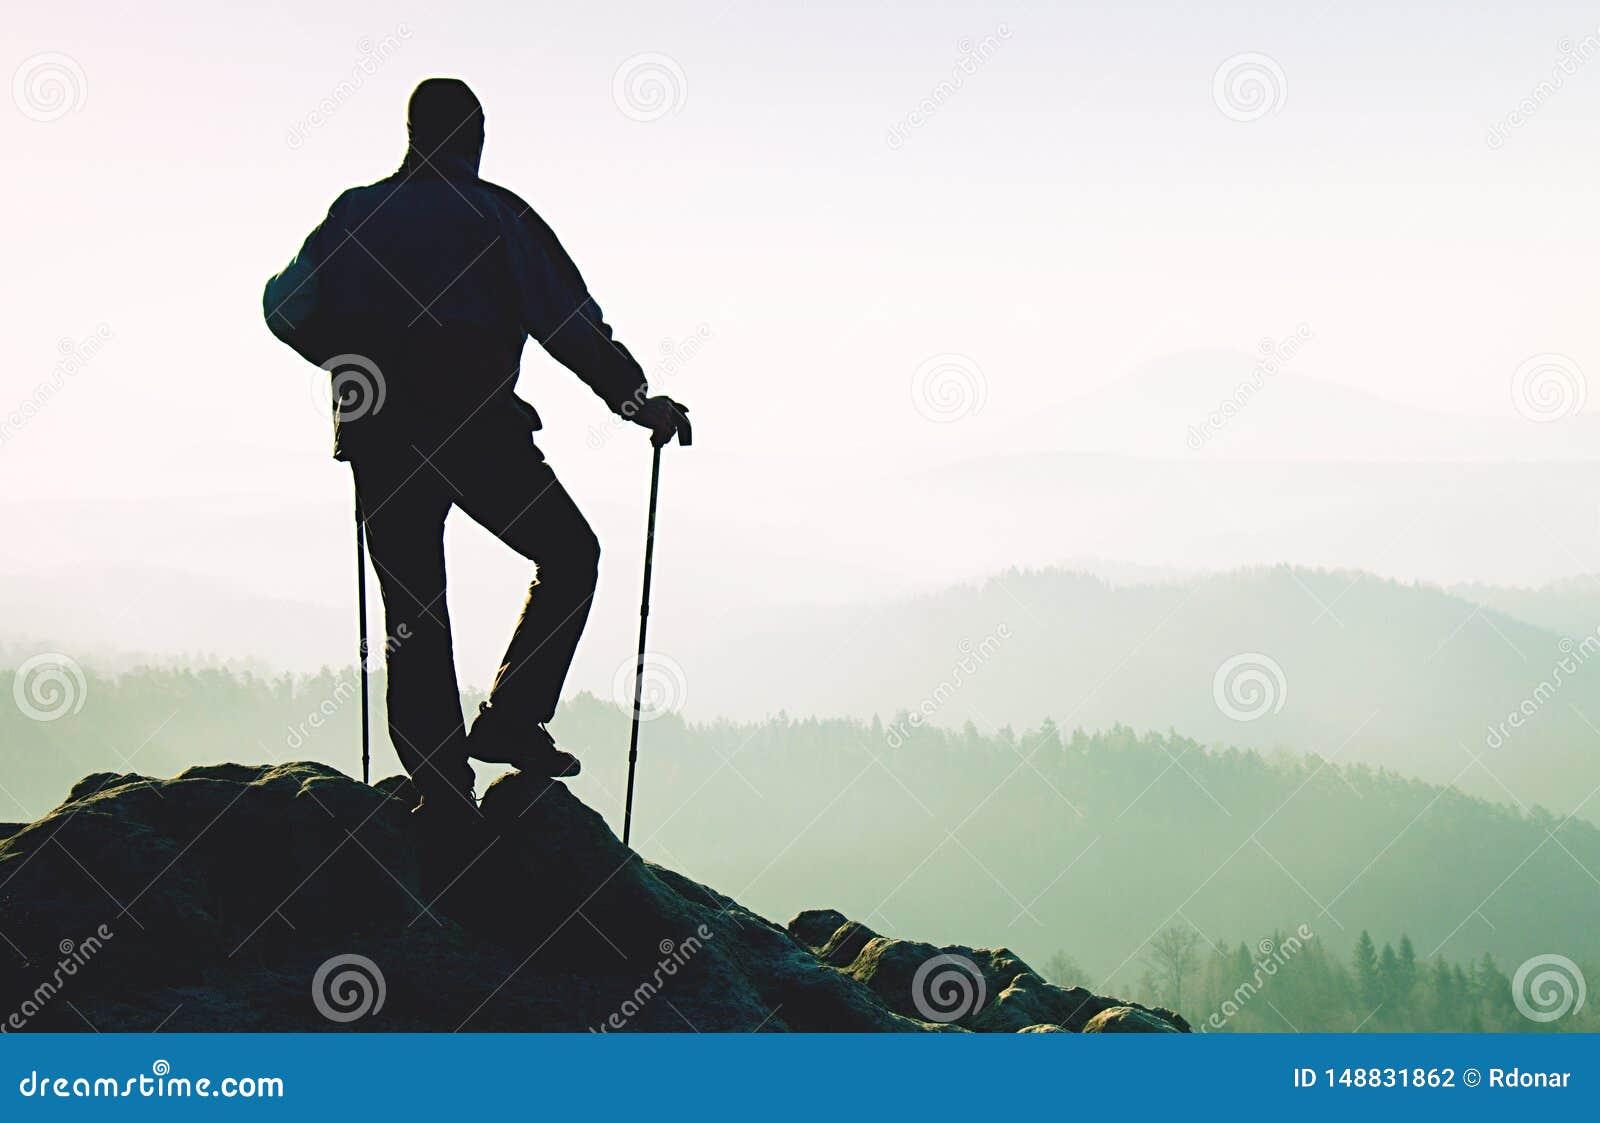 Tourist mit Pfosten in der Hand Sonnige Fr?hlingslandschaftsfelsiger Gipfel